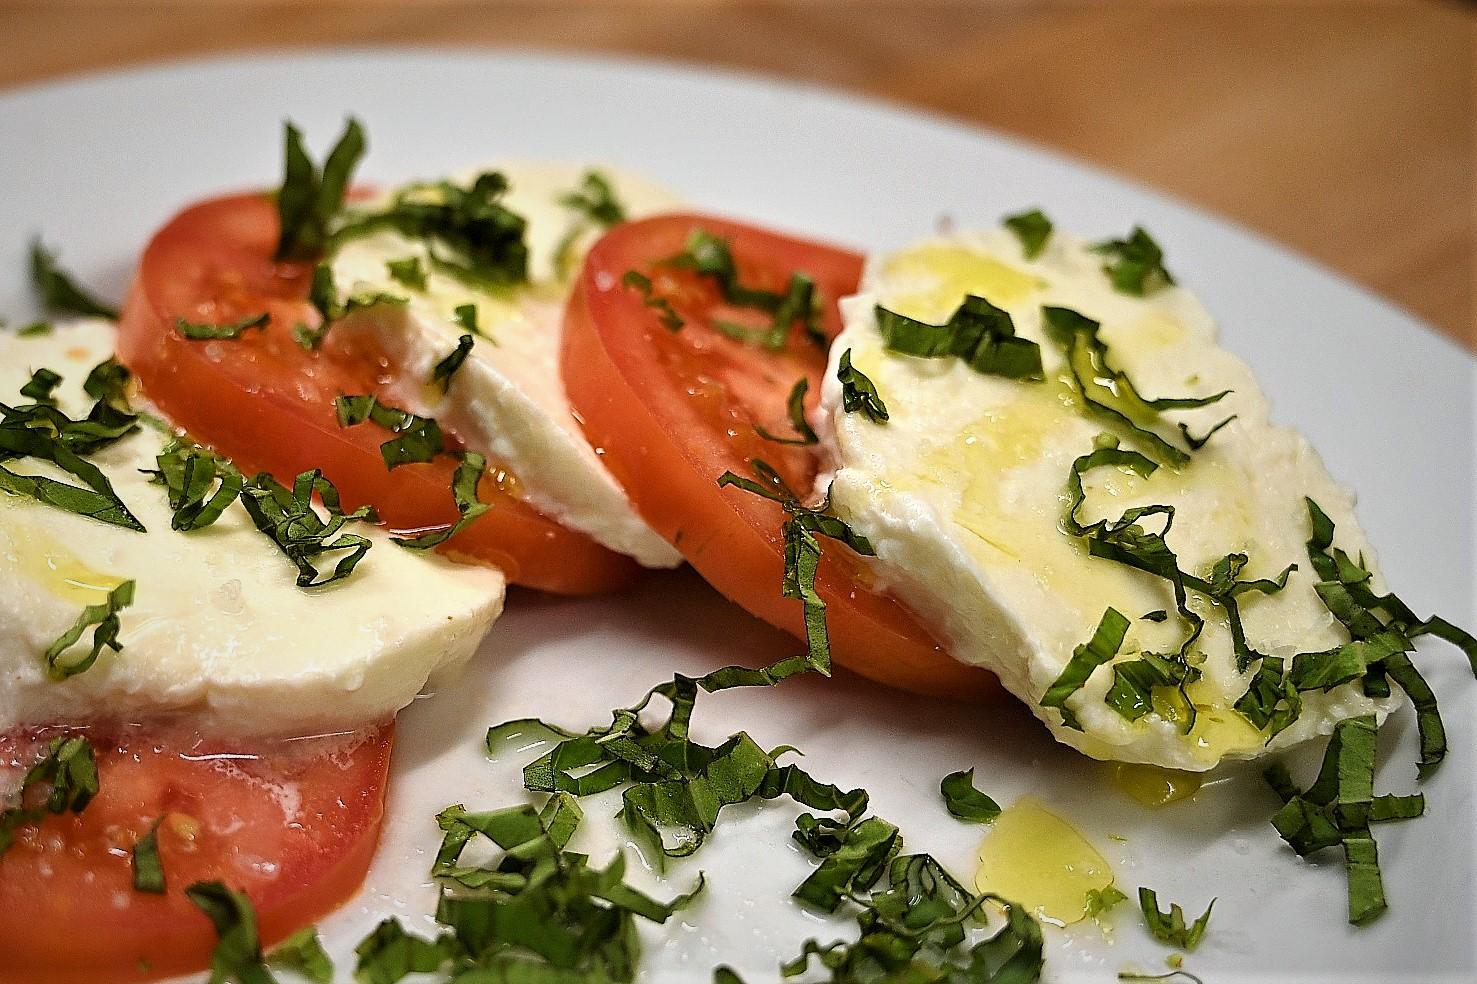 Handmade Mozzarella Caprese Salad